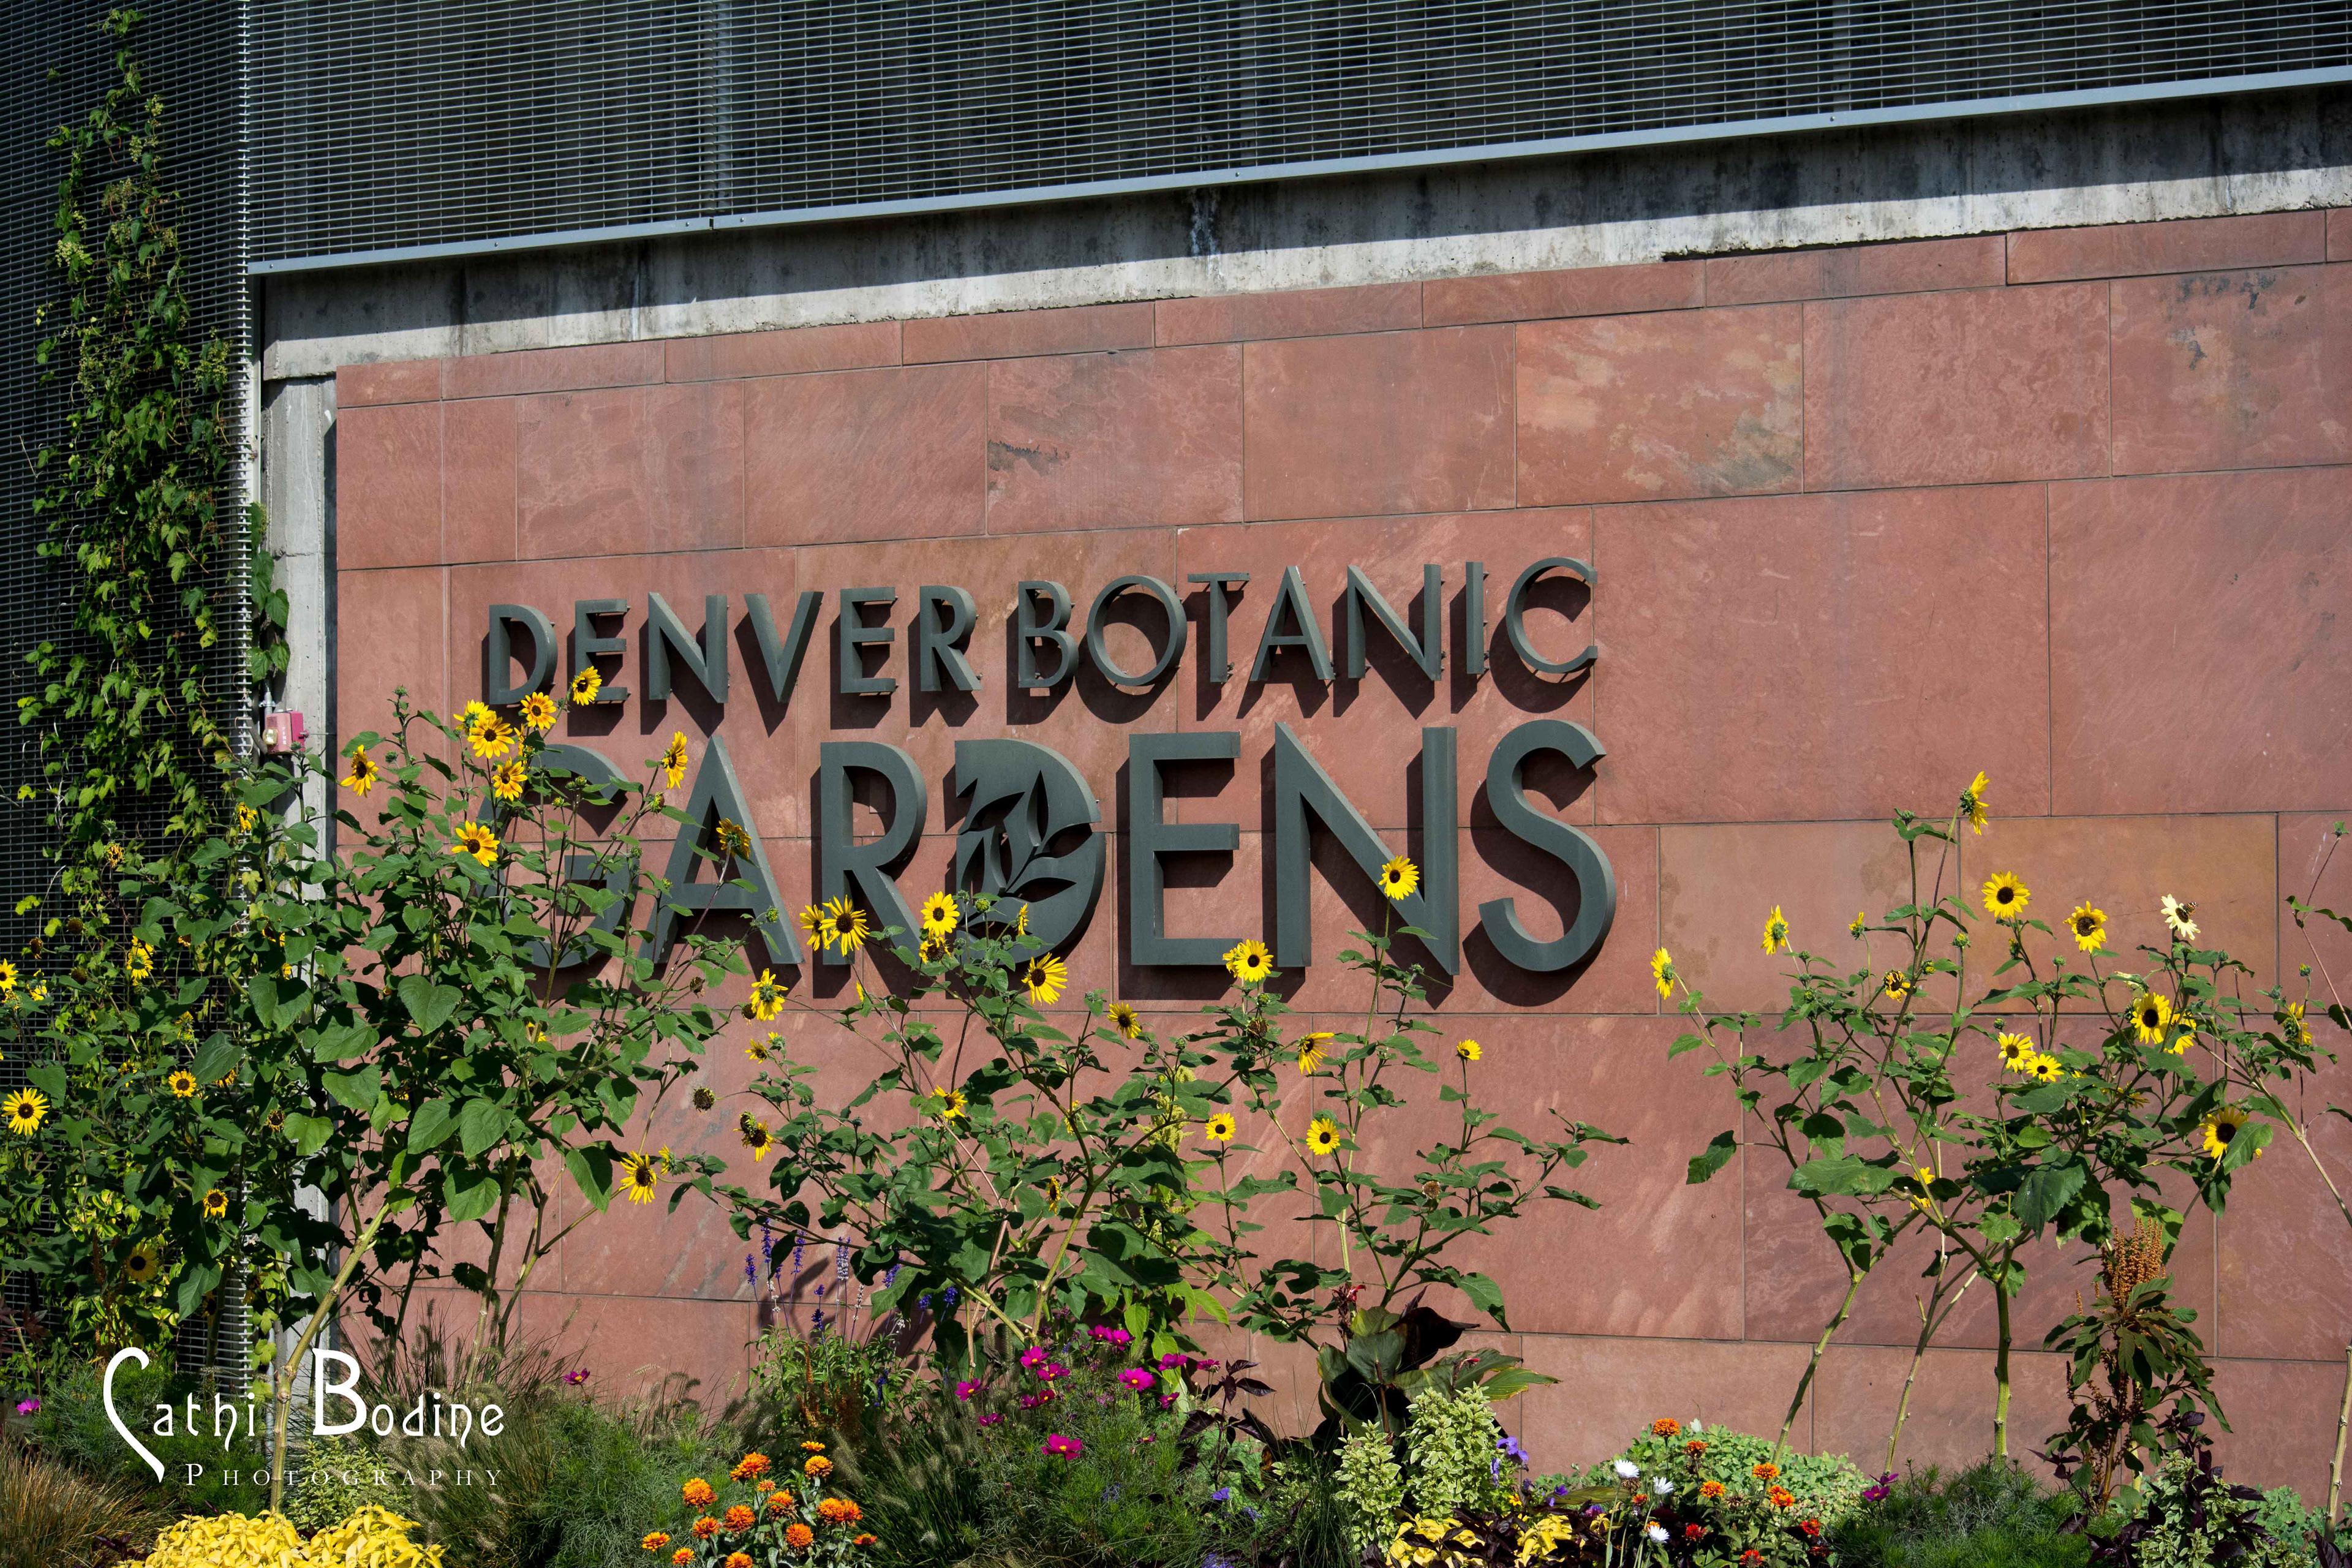 Cathi Bodine - Denver Botanic Gardens